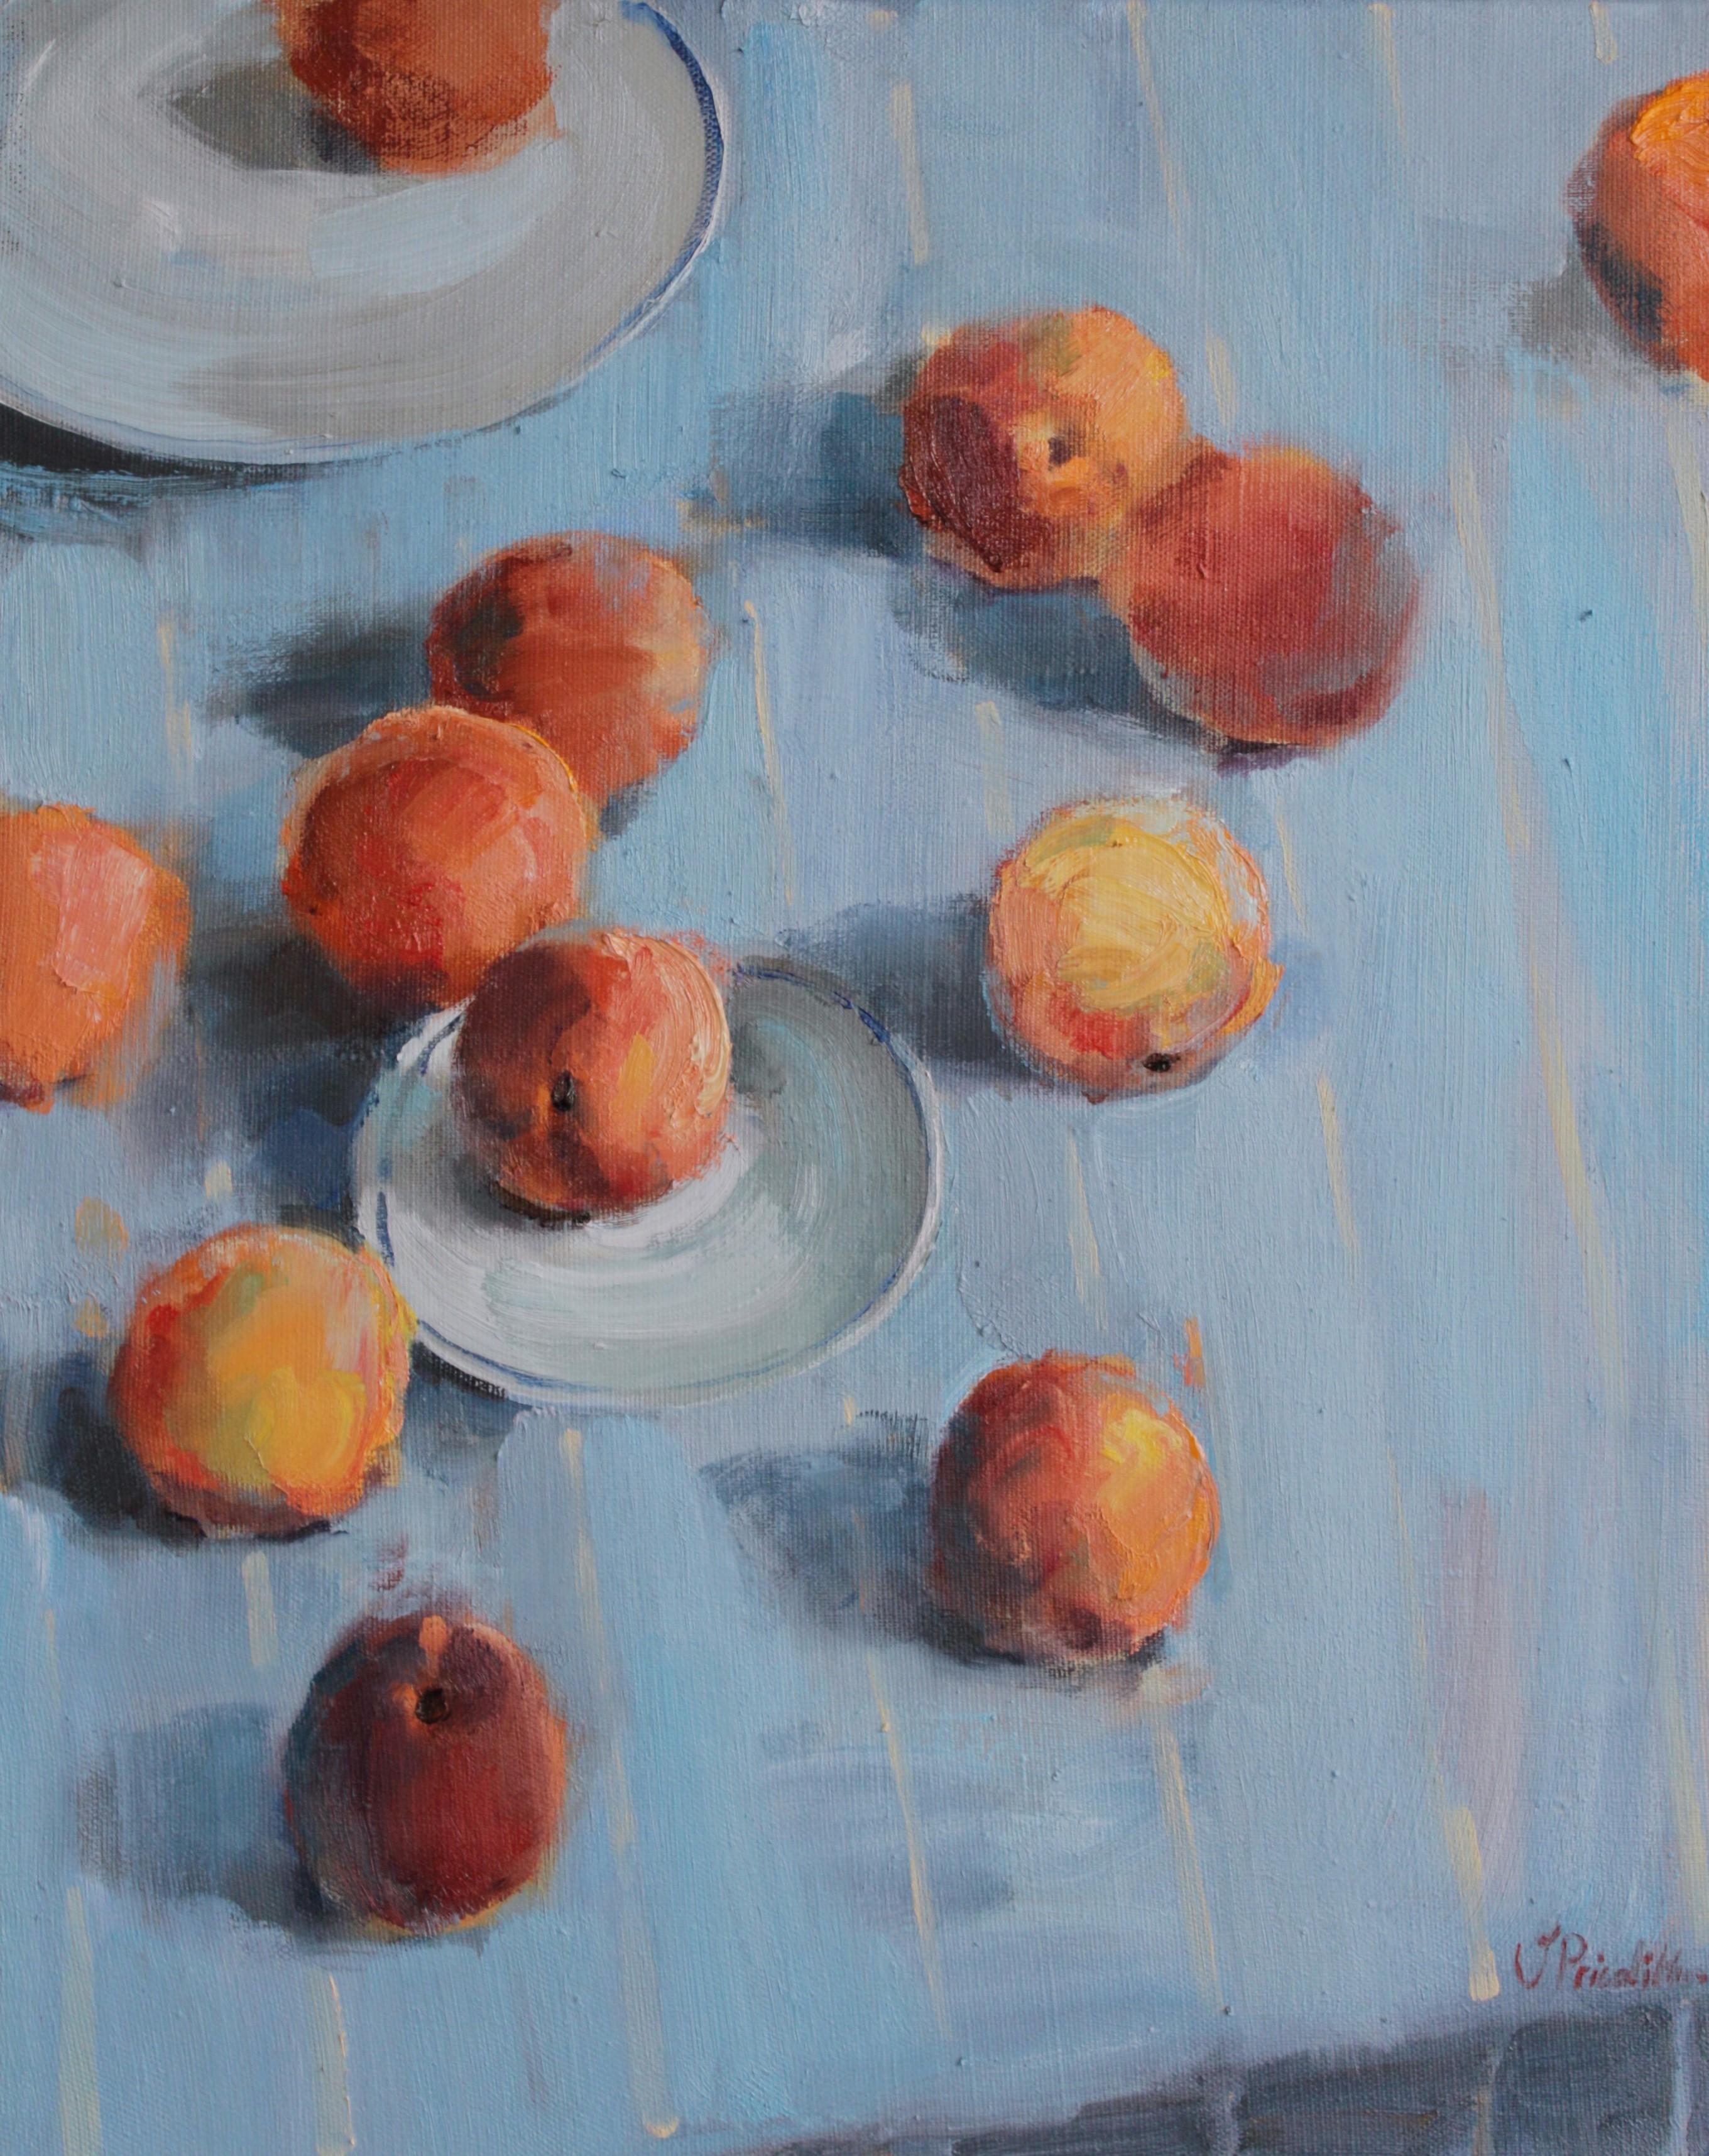 Peaches - Valeria Privalikhina 21st Century Contemporary Oil Painting Still Life